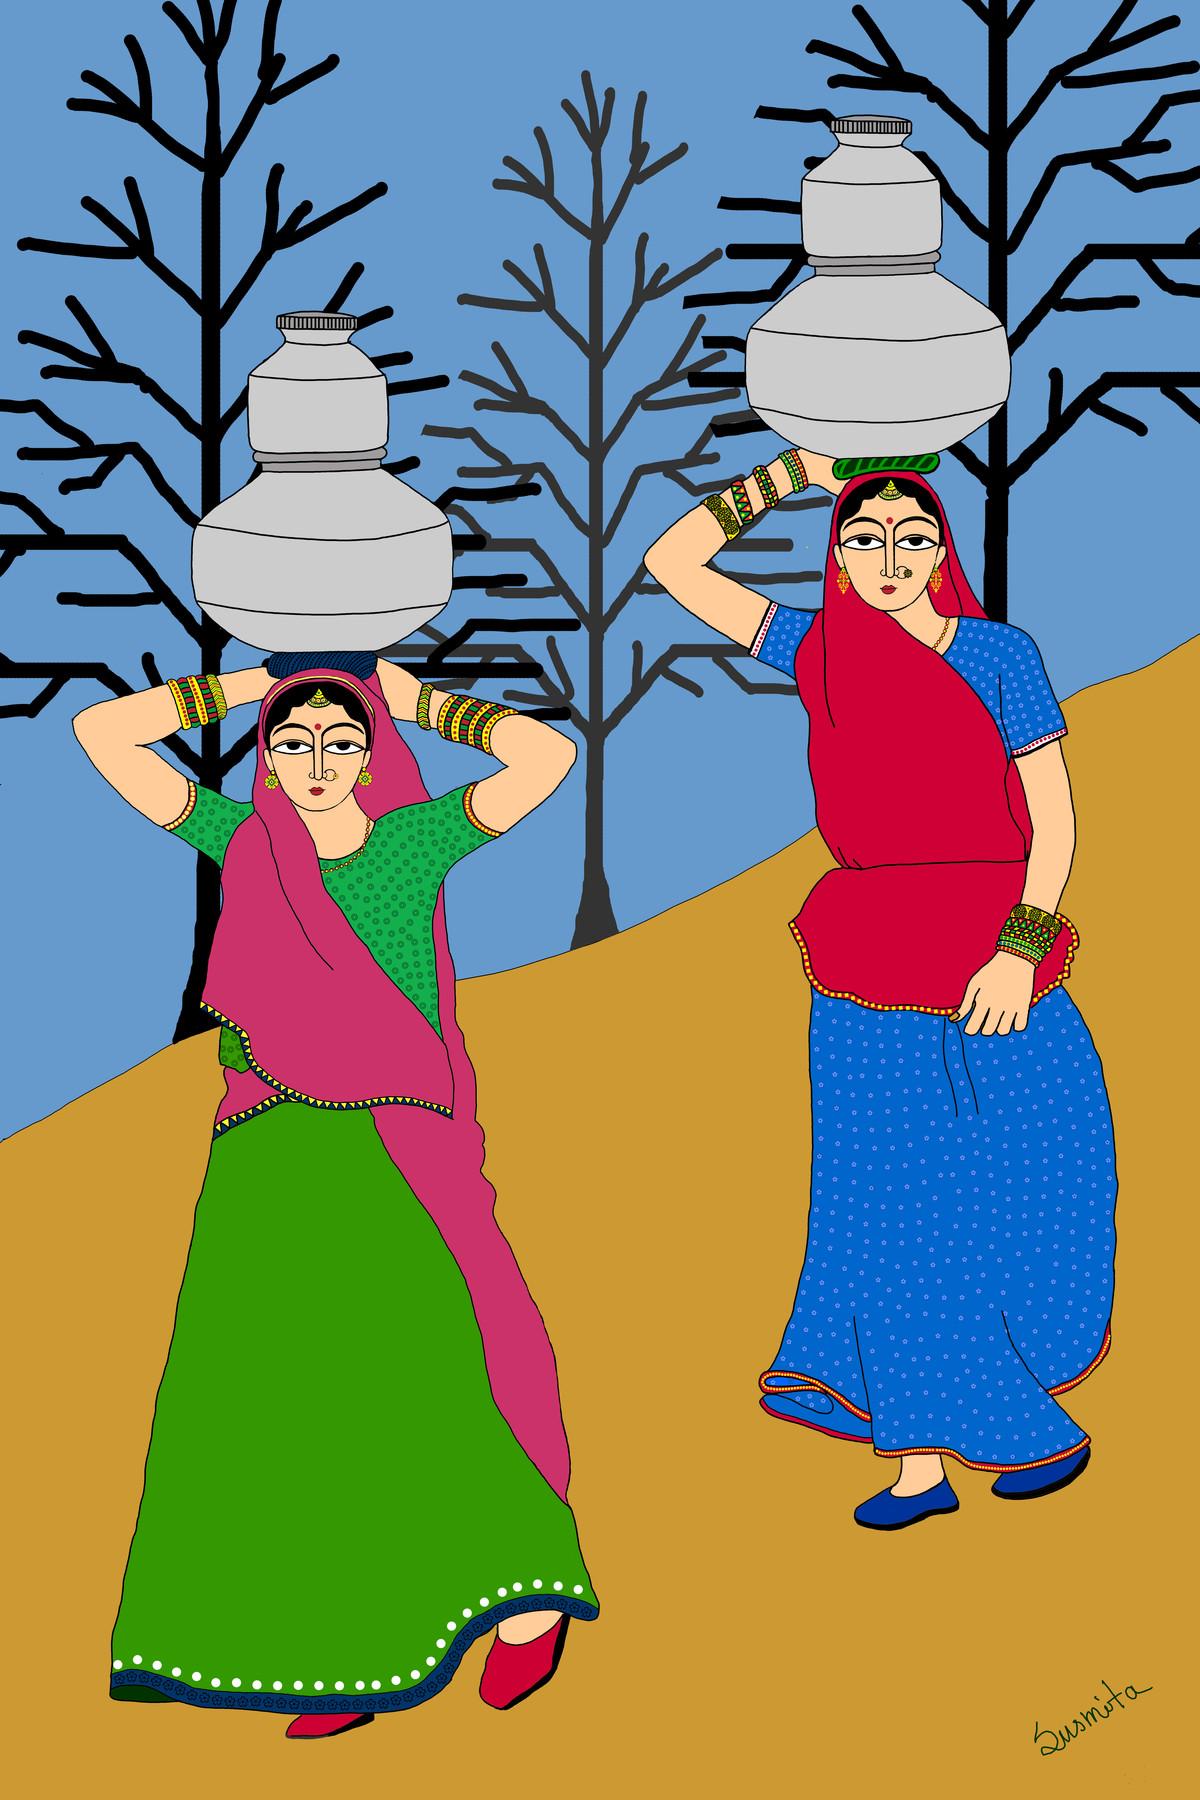 The water wives by Susmita Mishra, Digital Digital Art, Digital Print on Archival Paper,